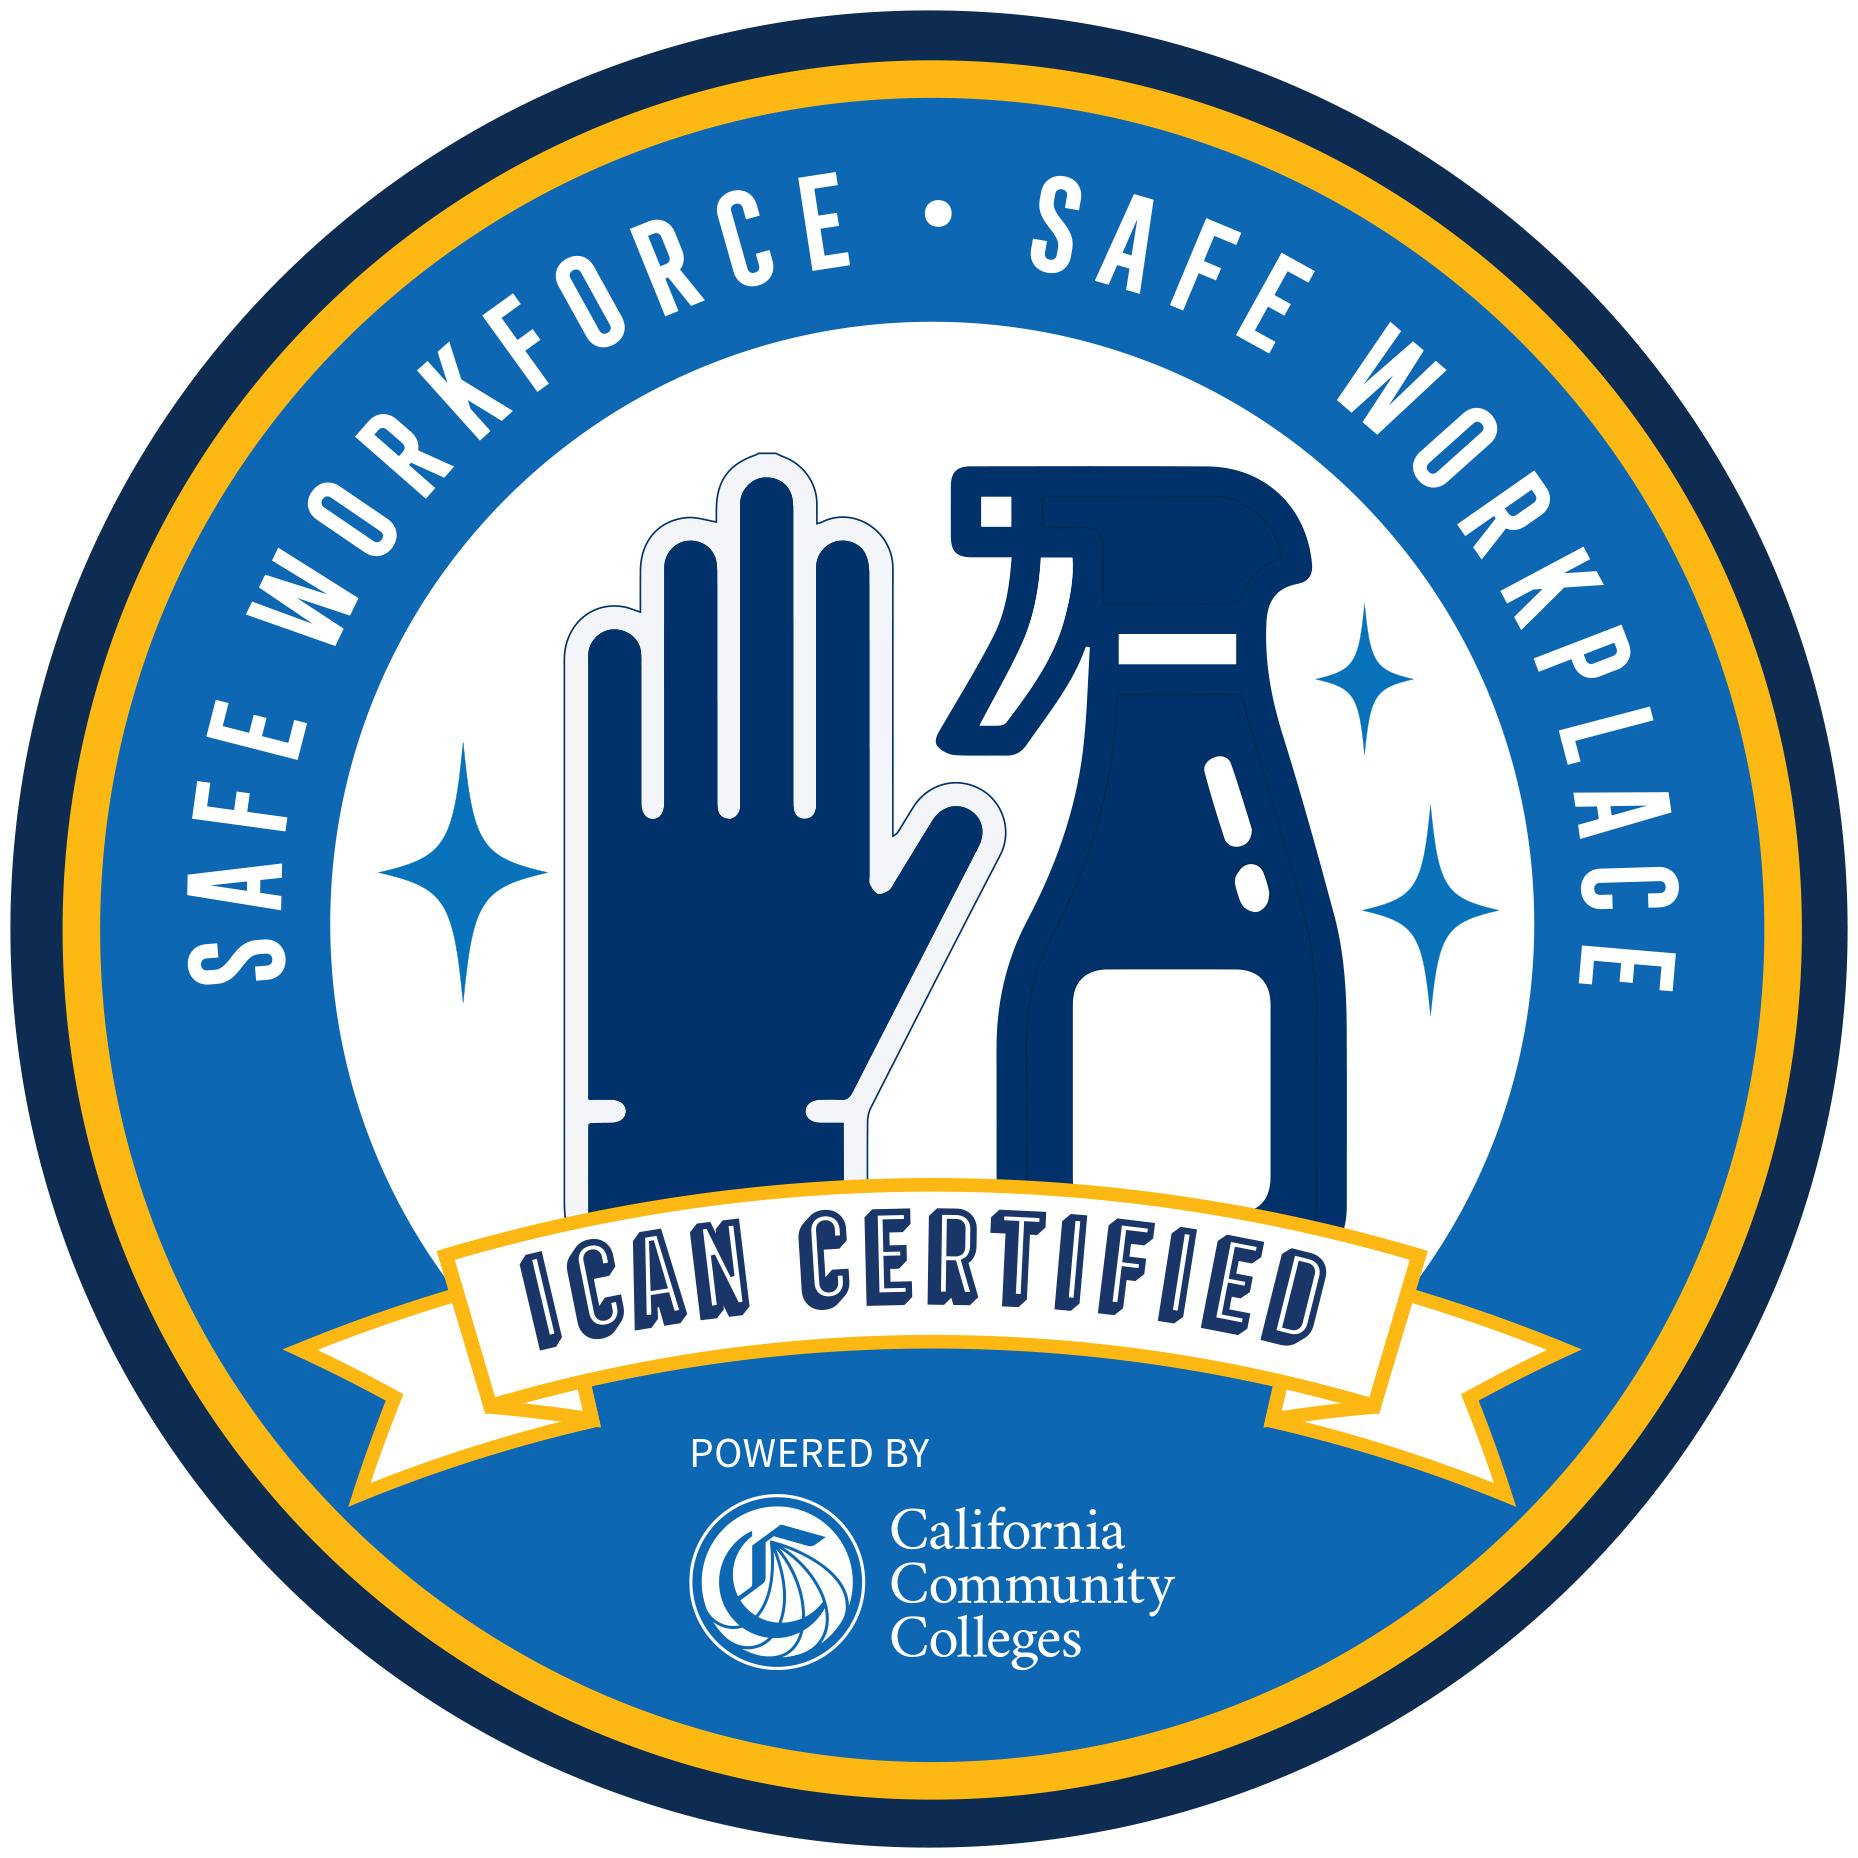 ICAN Certified logo